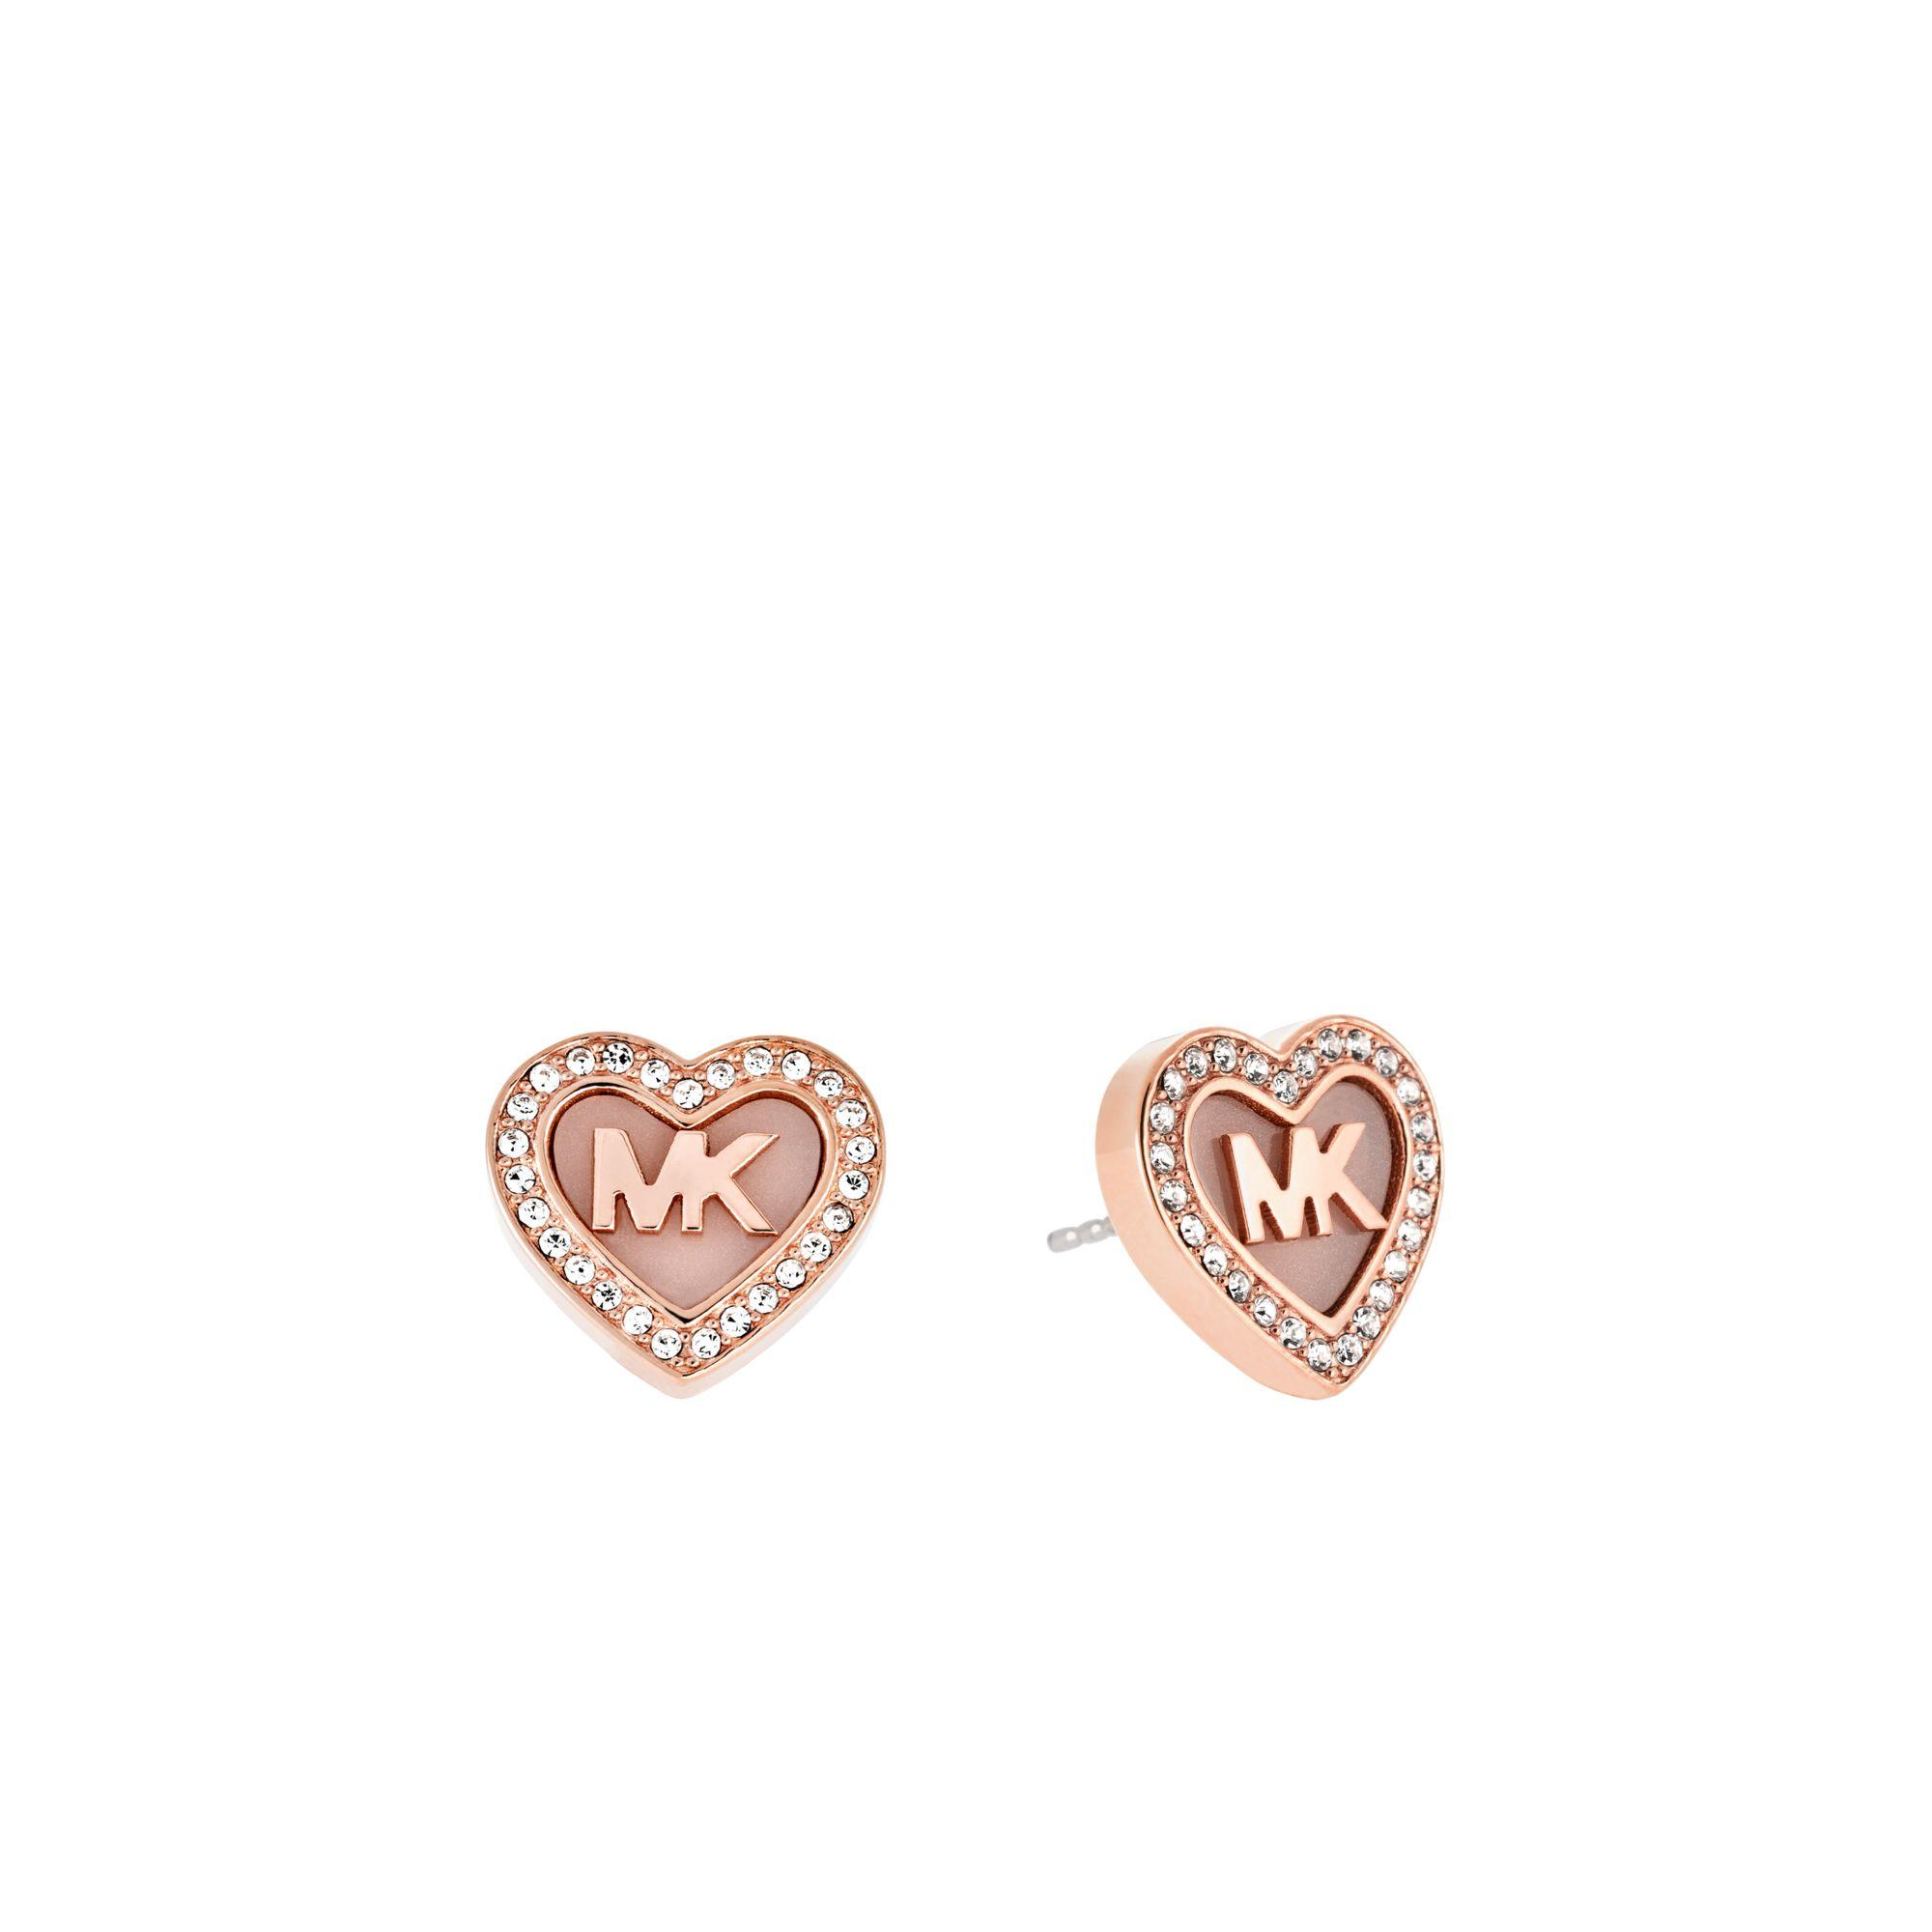 michael kors logo gold tone earrings. Black Bedroom Furniture Sets. Home Design Ideas